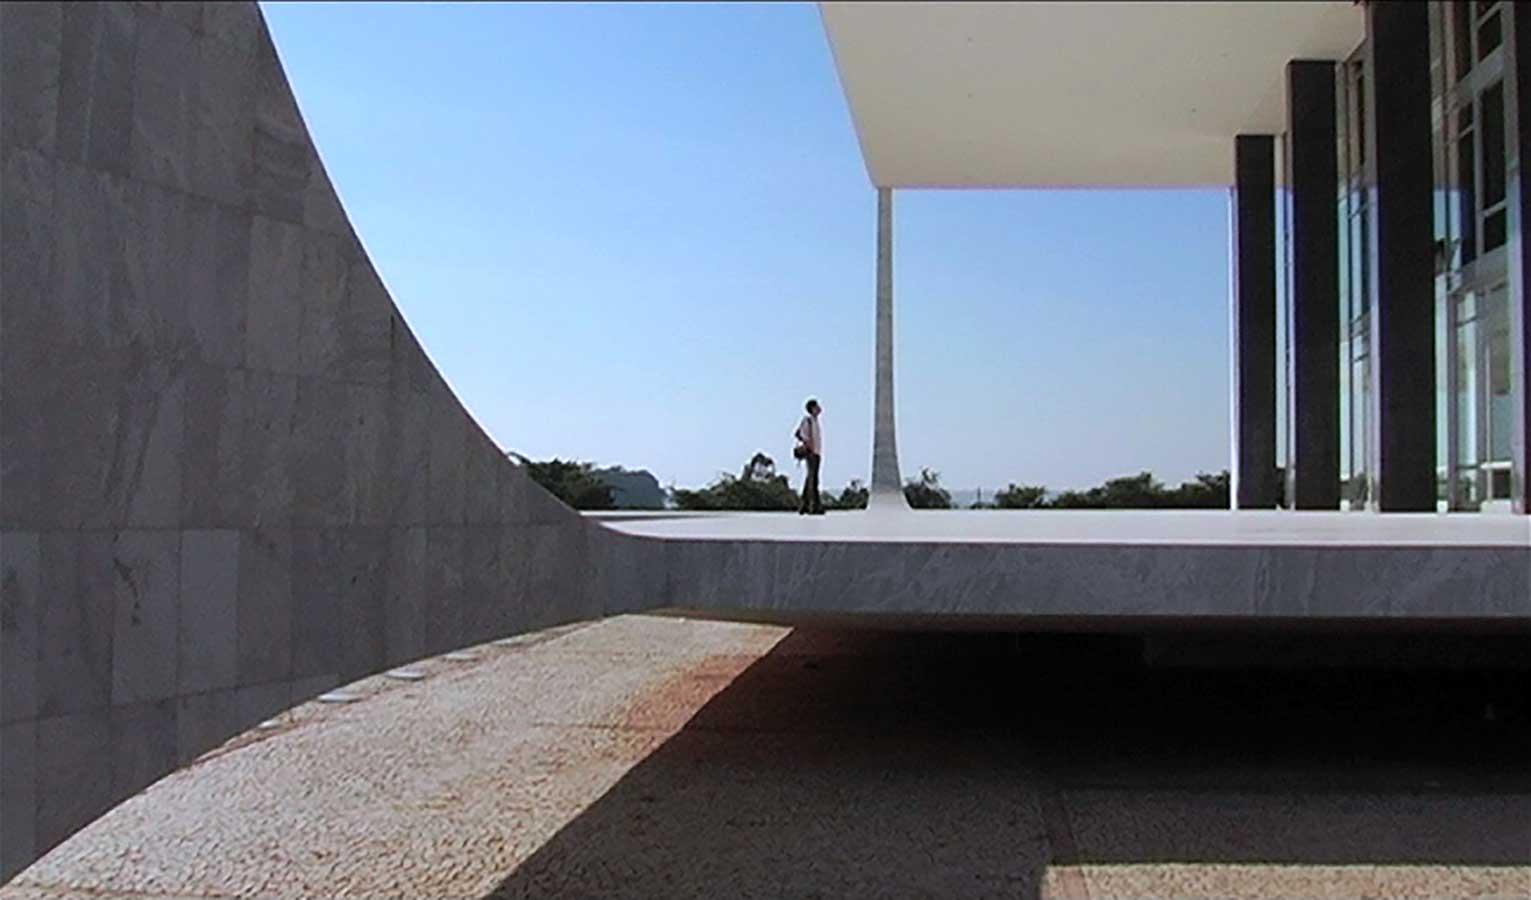 Louidgi Beltrame, Brasilia/Chandigarh